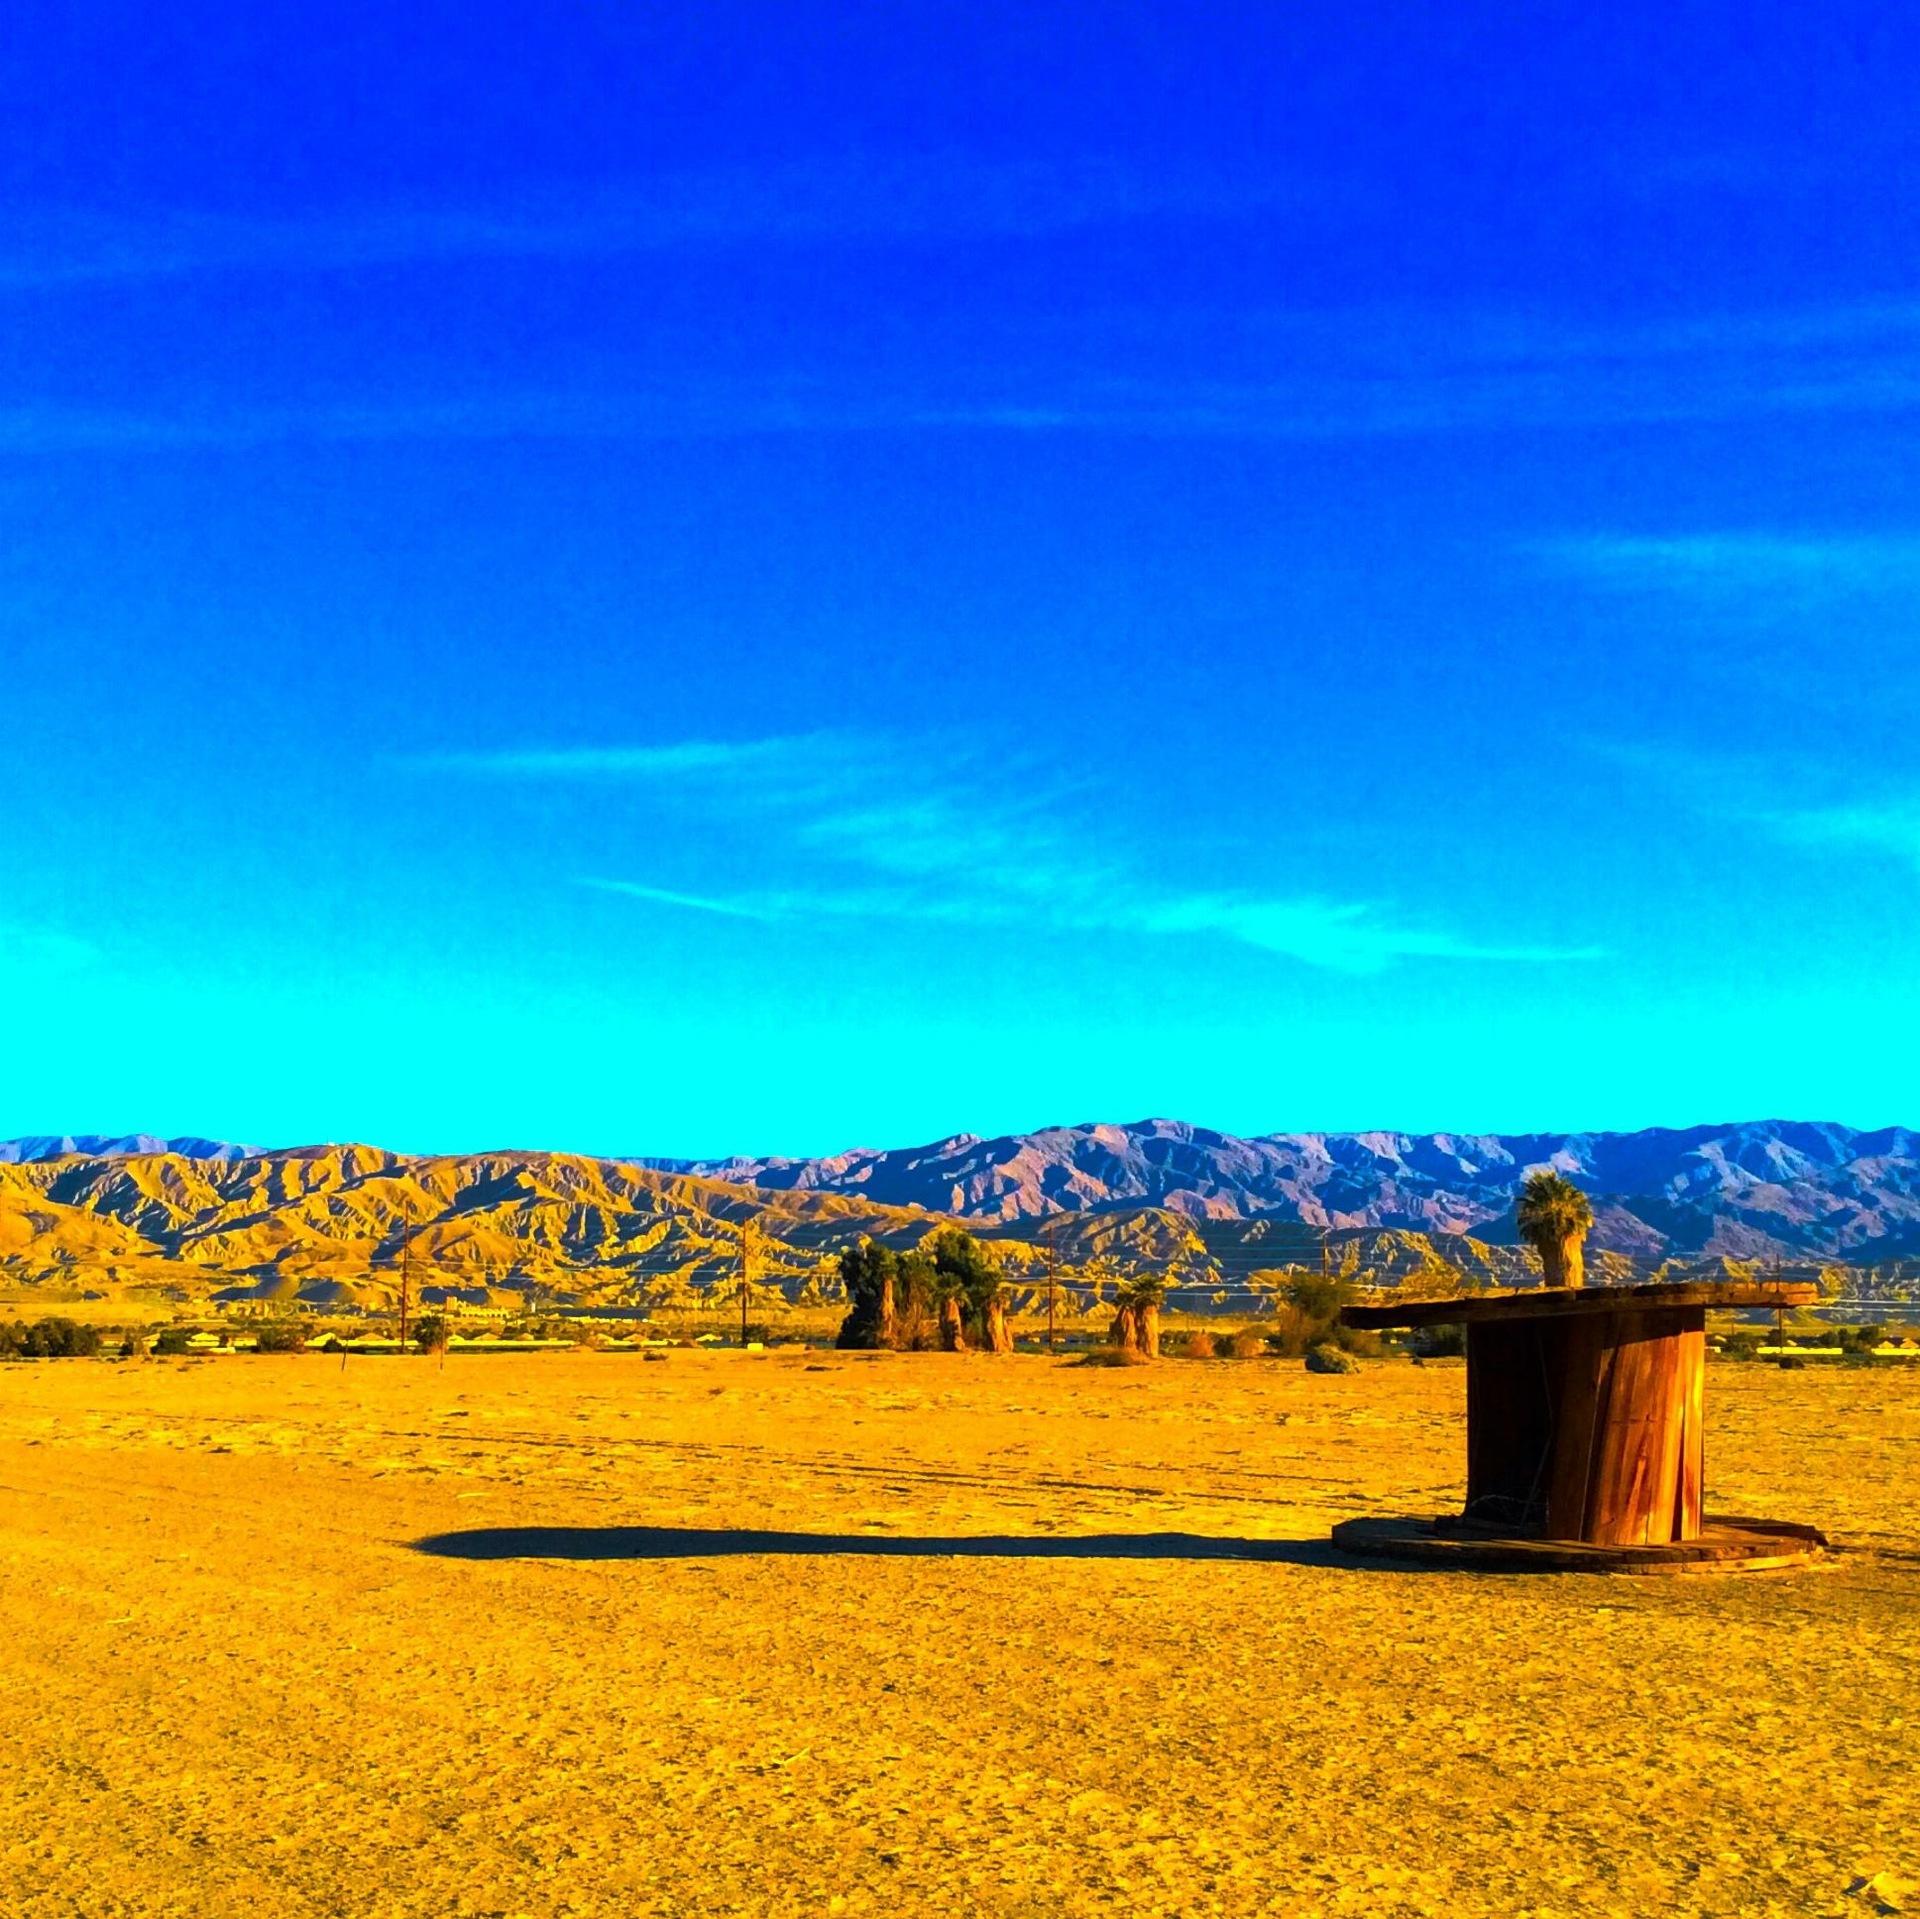 Desert scape Southetn California, Indio California.